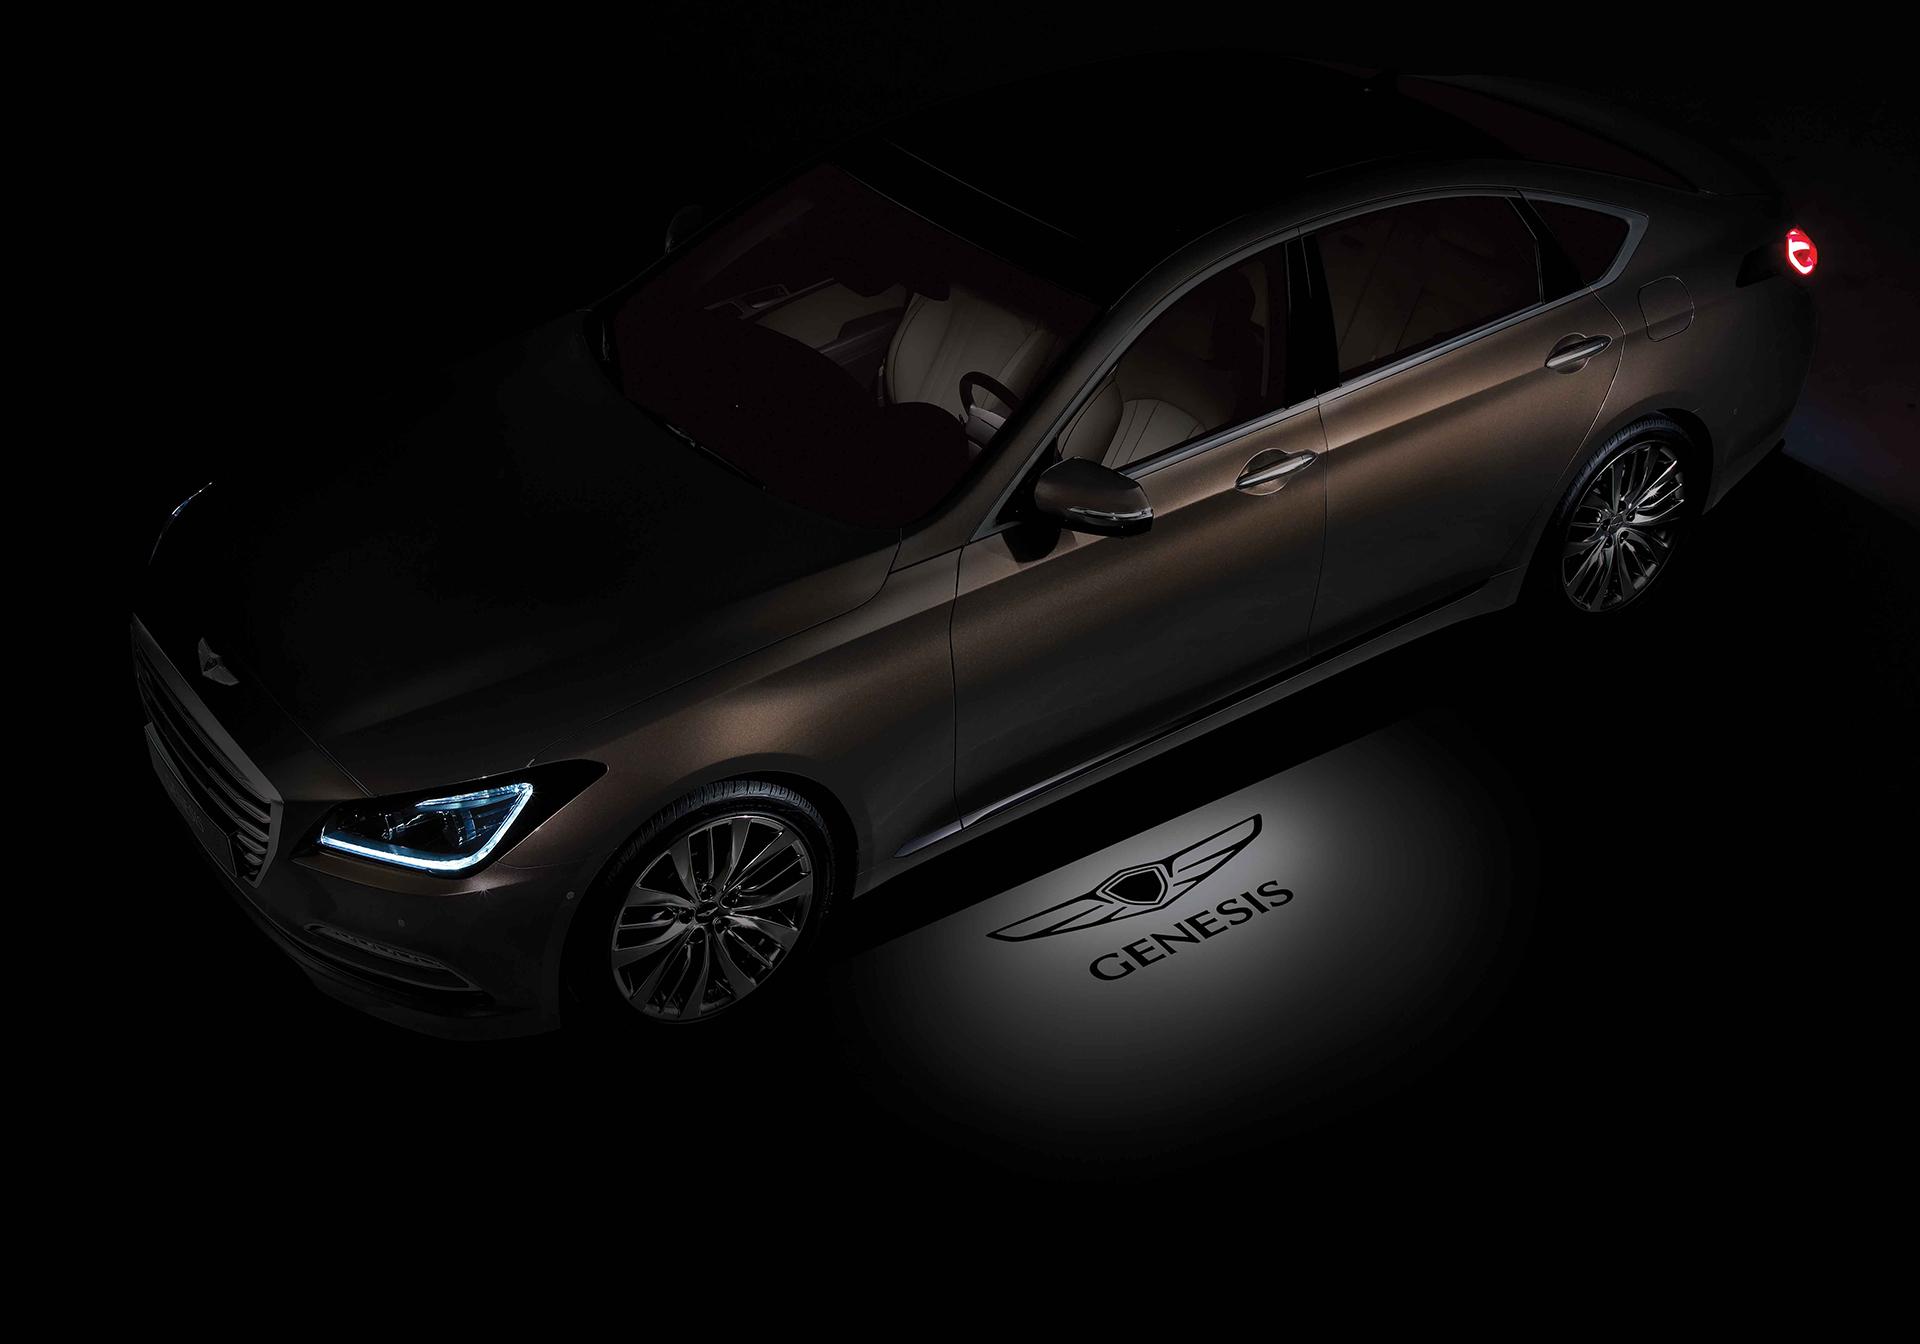 Genesis G90 - 2016 - light